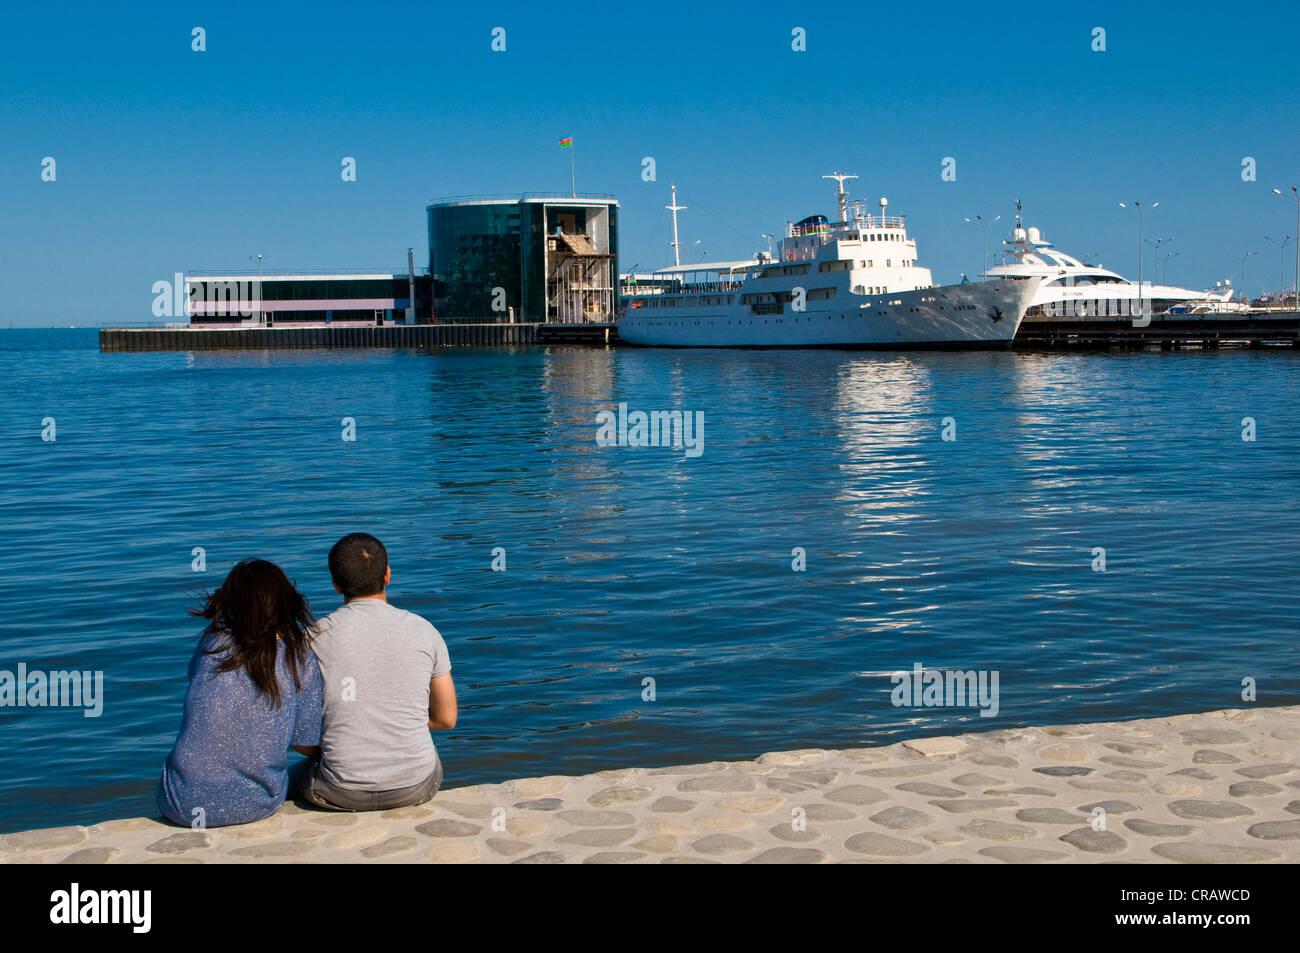 Couple on the promenade of Baku, Azerbaijan, Middle East Stock Photo